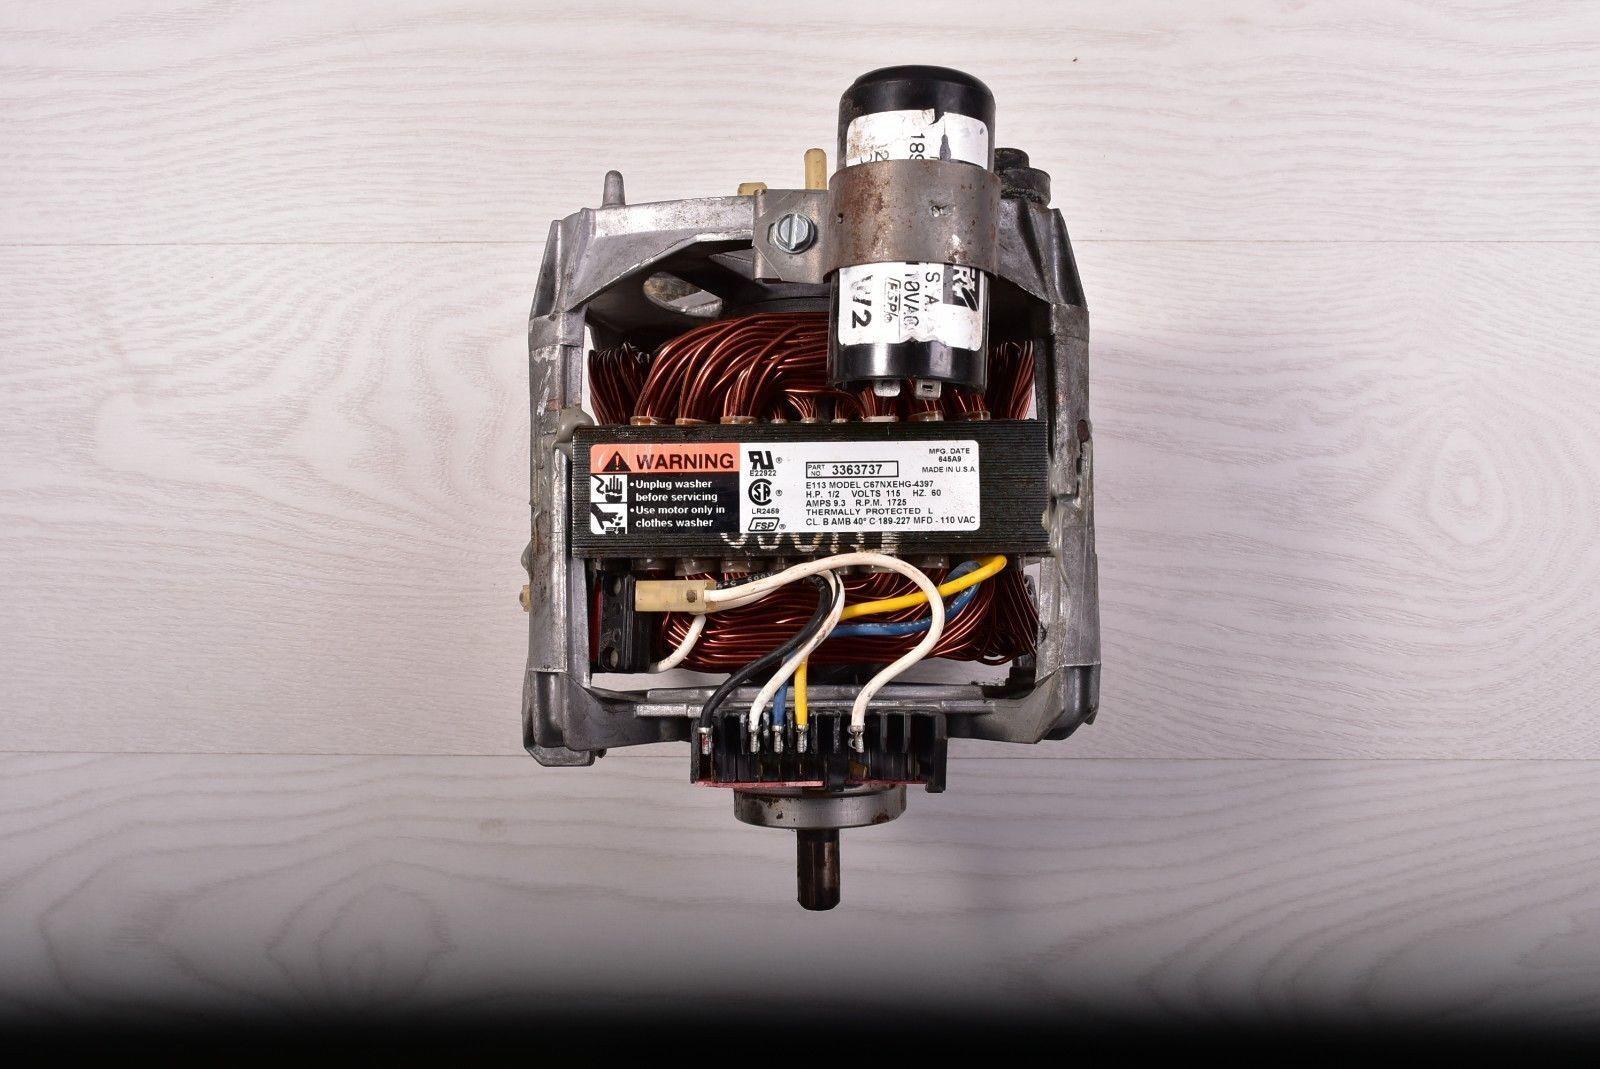 Kenmore Whirlpool Washer Motor 3363737 C67nxehg 4397 Ebay 661600 Wiring Schematic